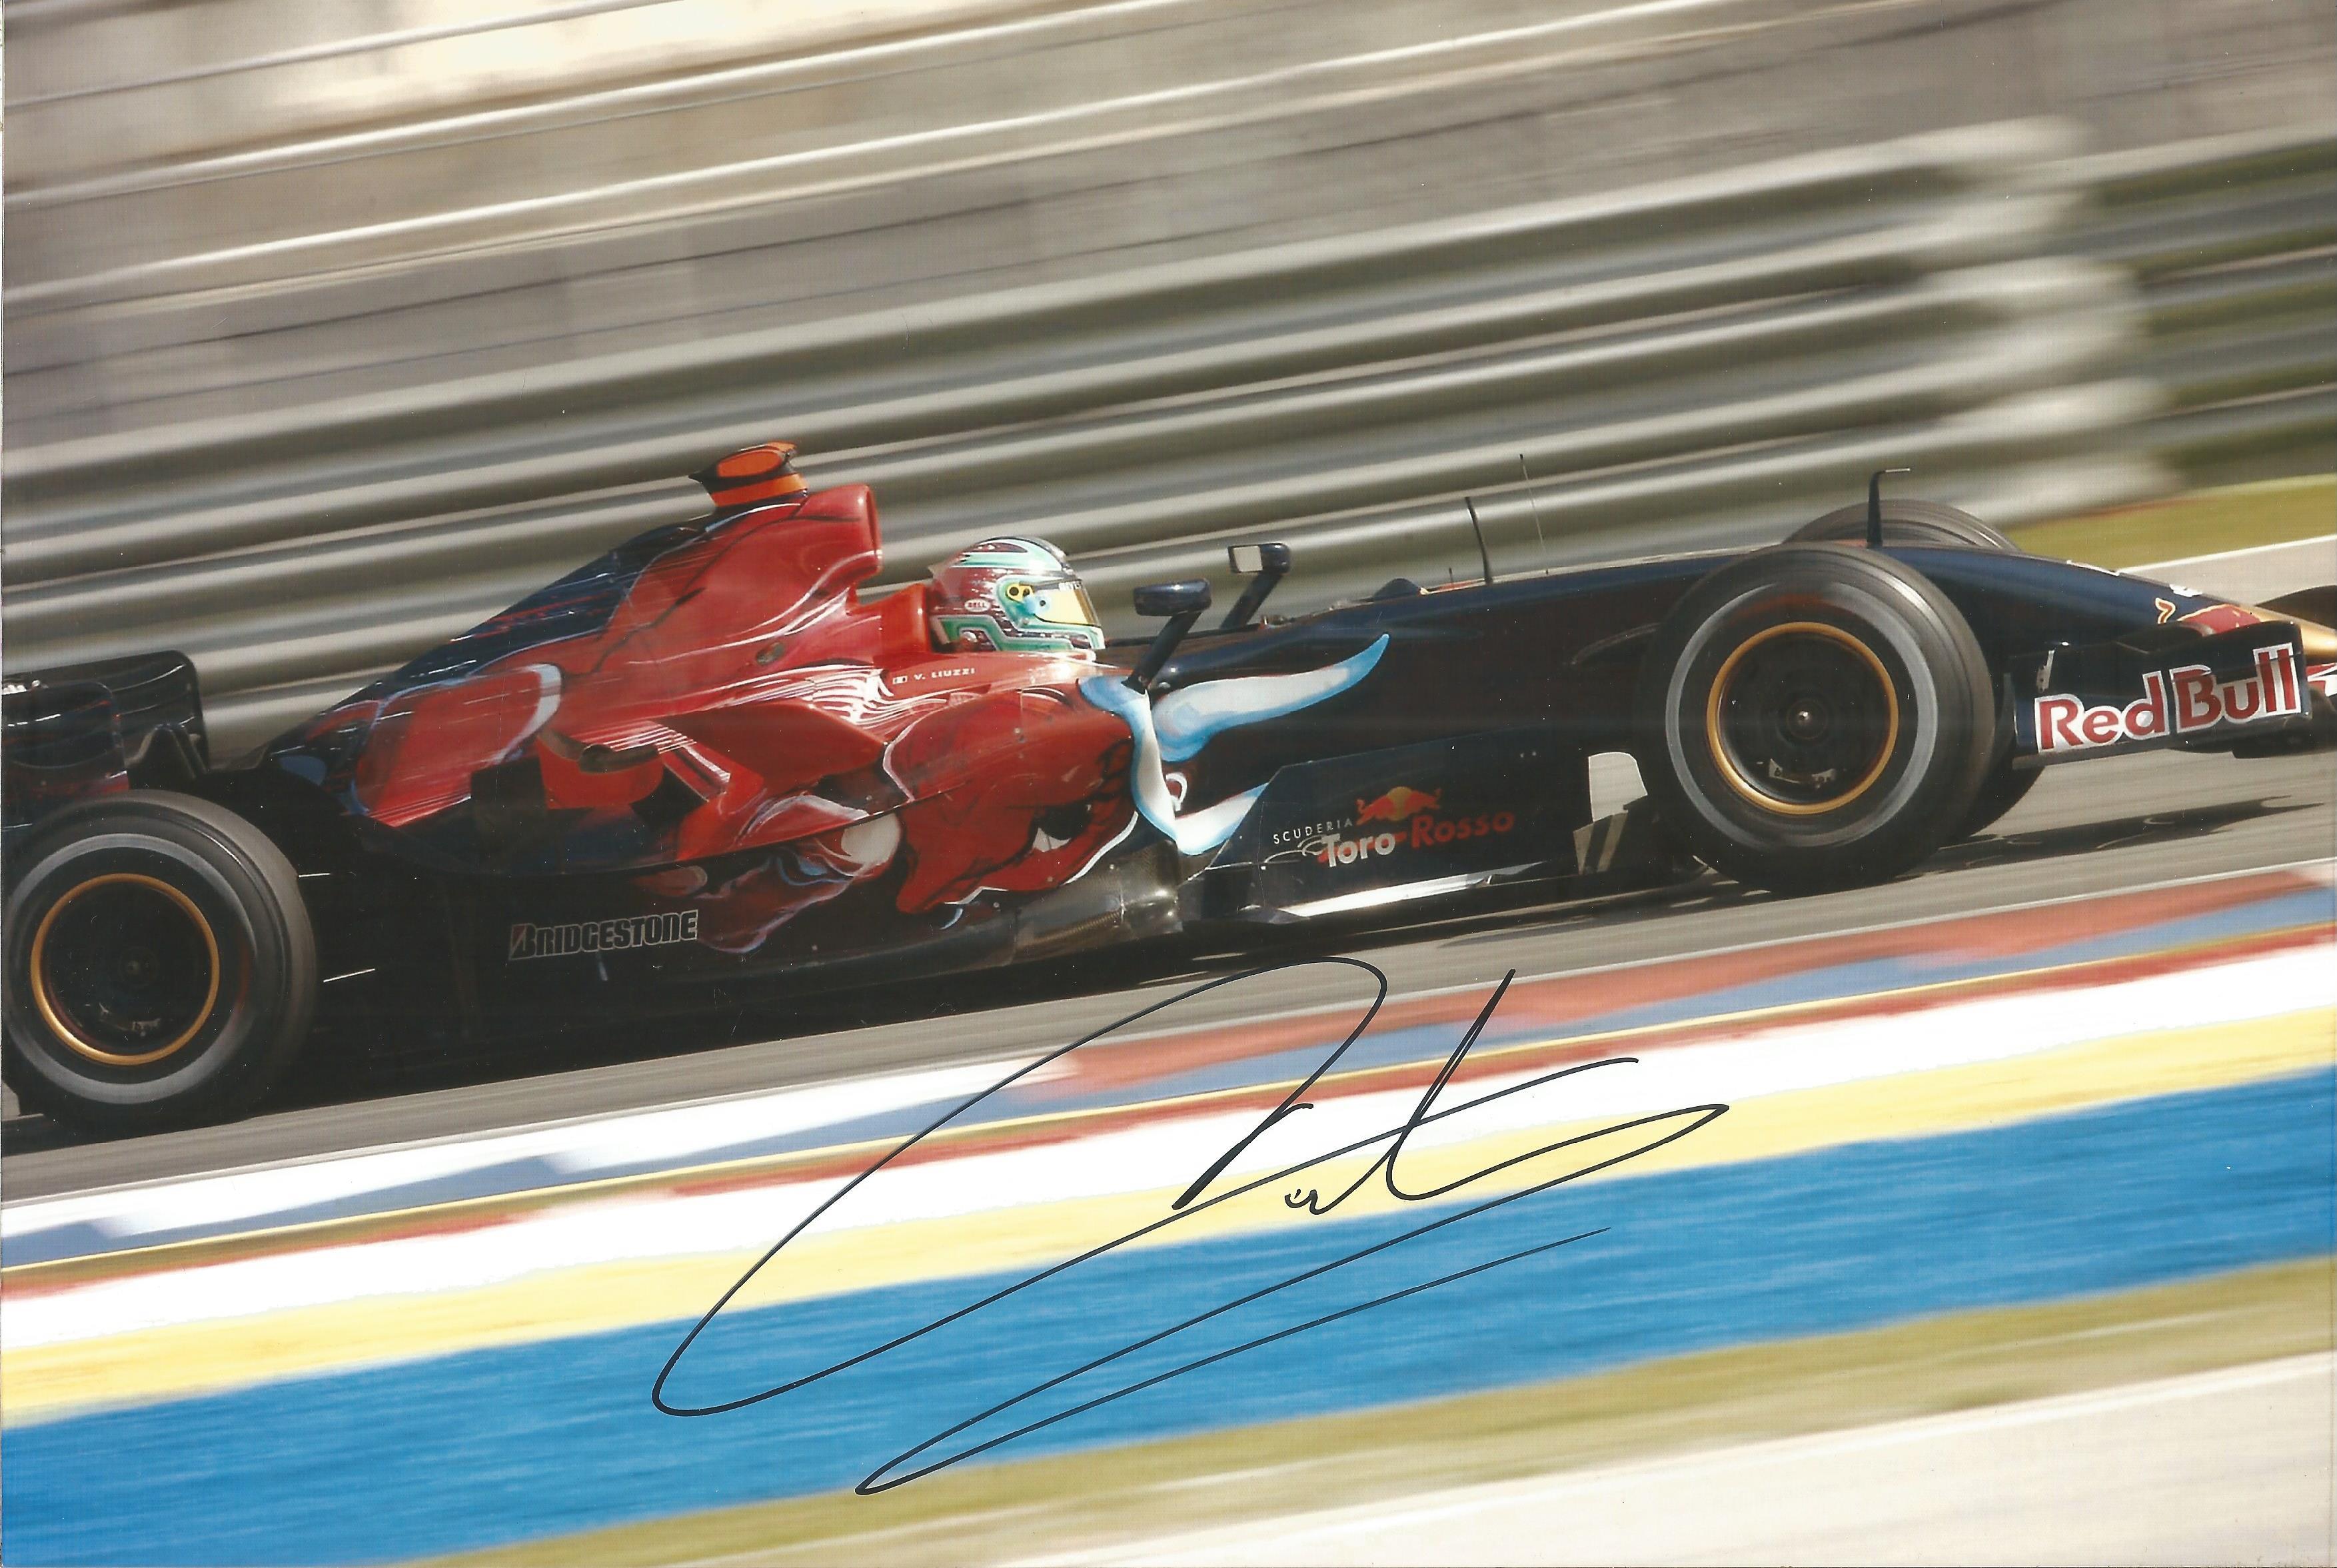 Vitantonio Liuzzi signed 12x8 colour photo. Good Condition. All autographs come with a